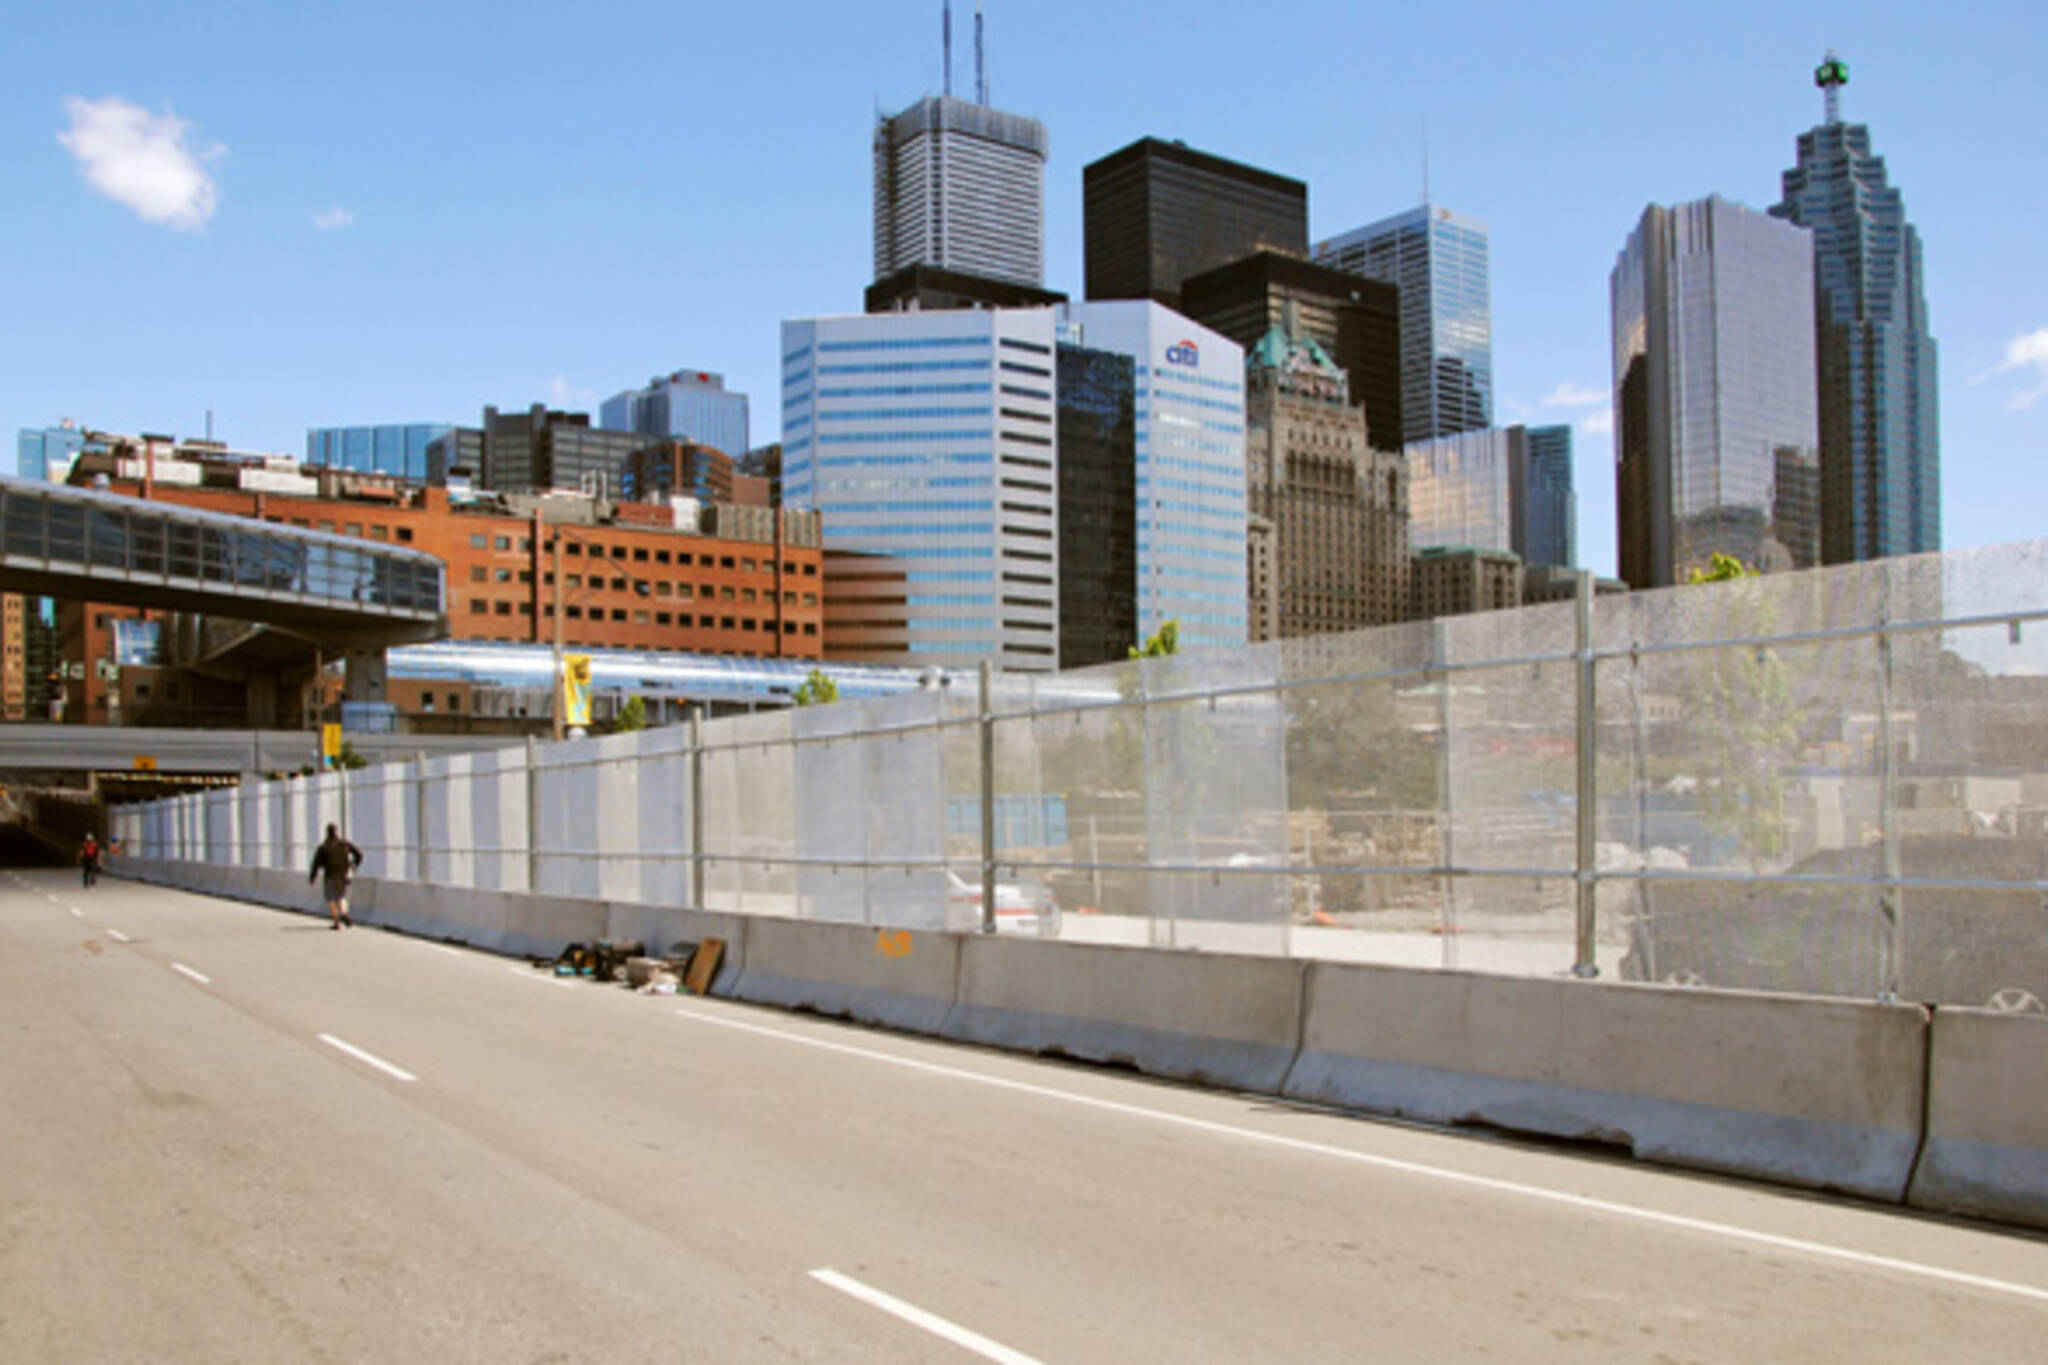 G20 security fence toronto